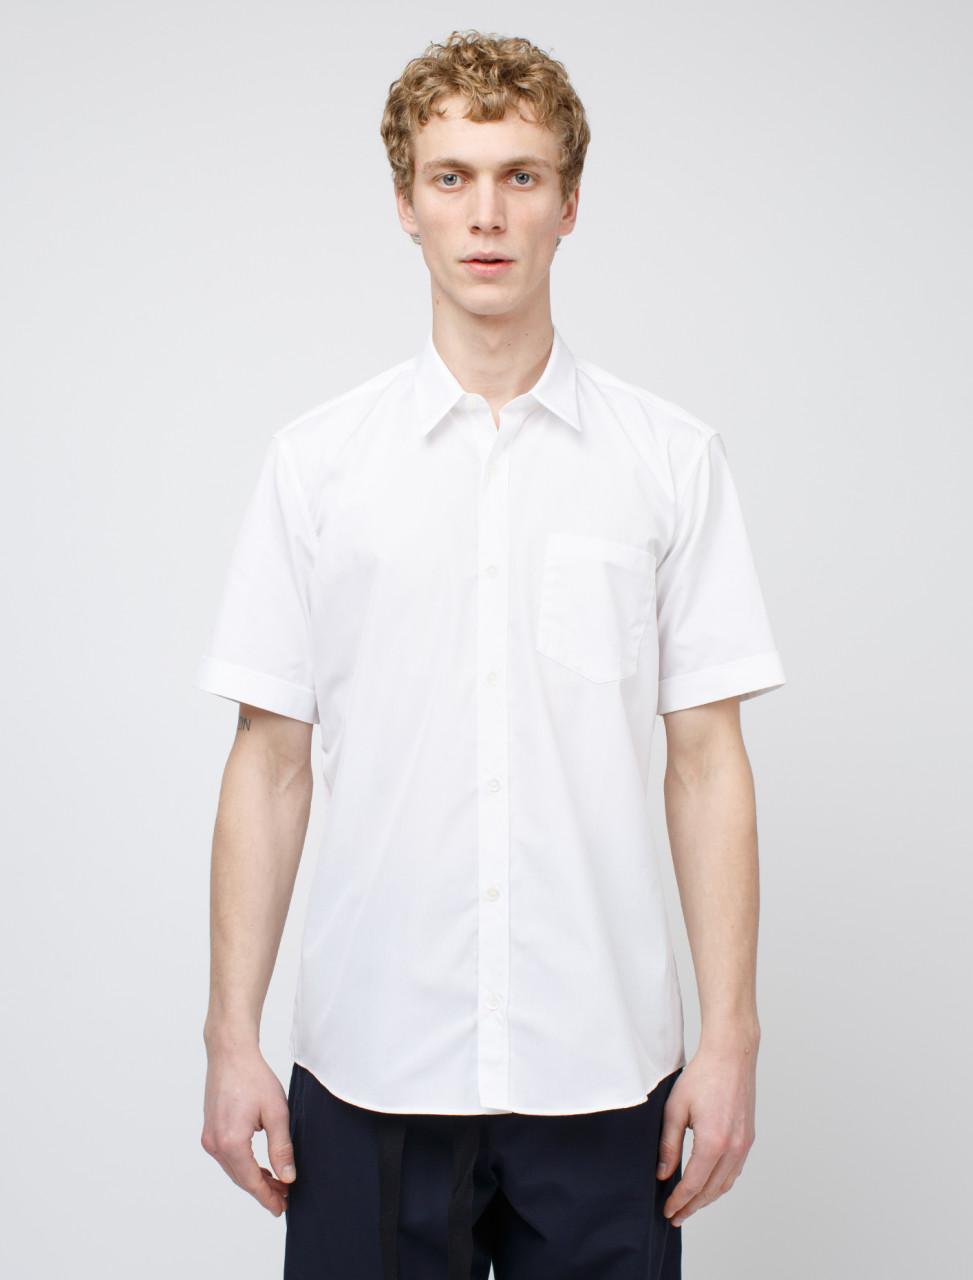 Citny Shirt